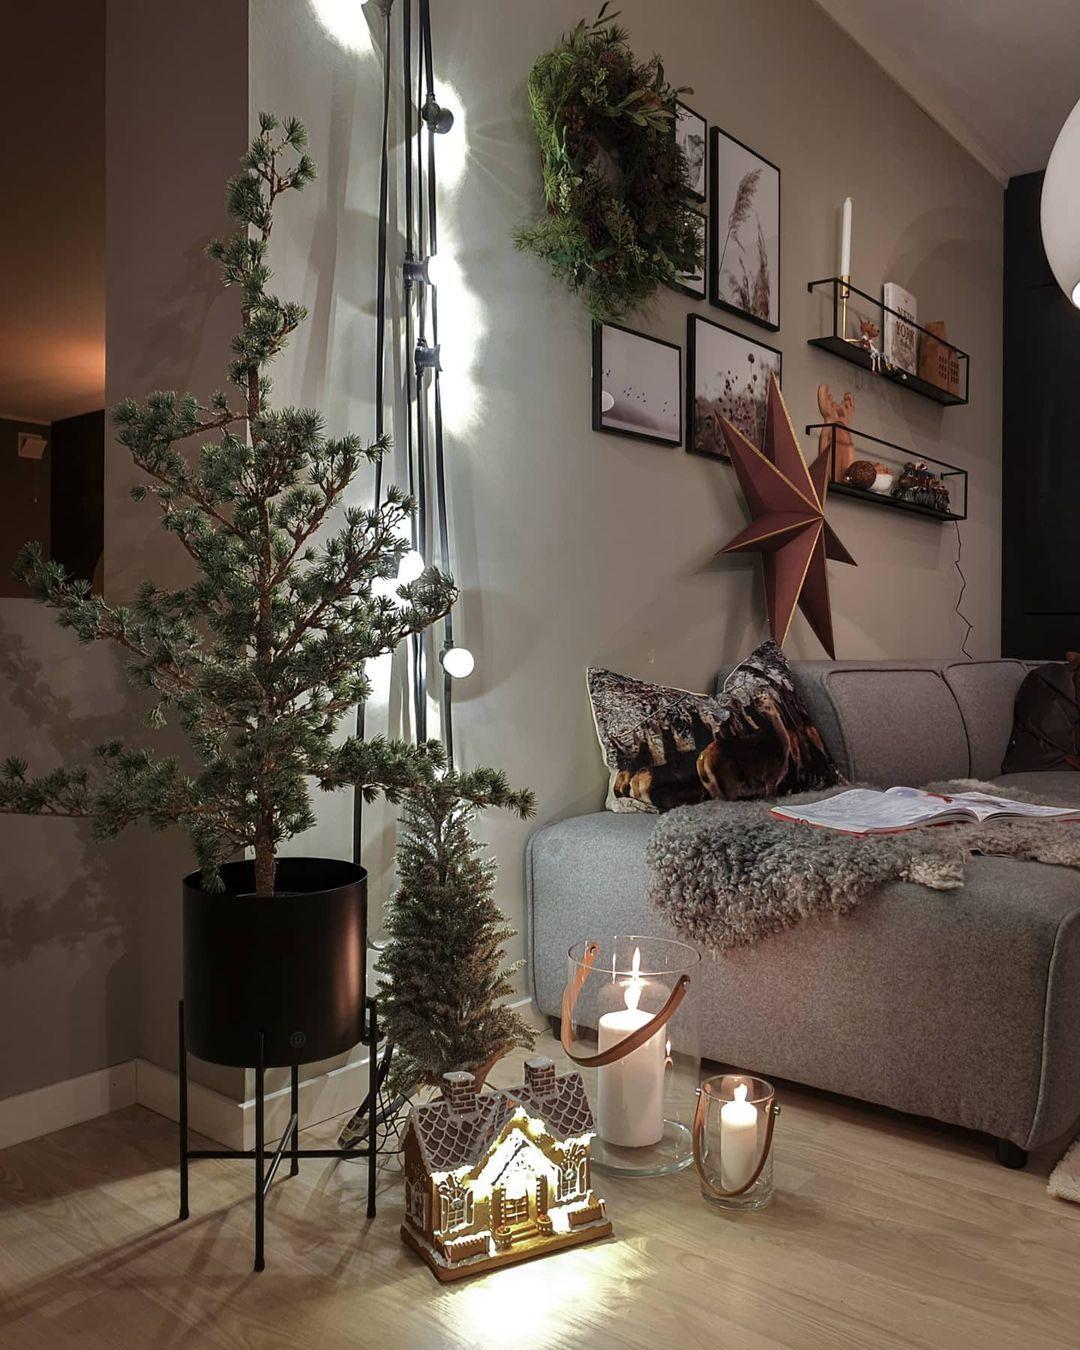 "Interiør, garden & fashion on Instagram: ""Last year x-mas ❄🎄 . . . #jultre #julestjerne #multitrend #scandinaviandesign #julestjerne #scandinavianinterior #roomforinspo…"""